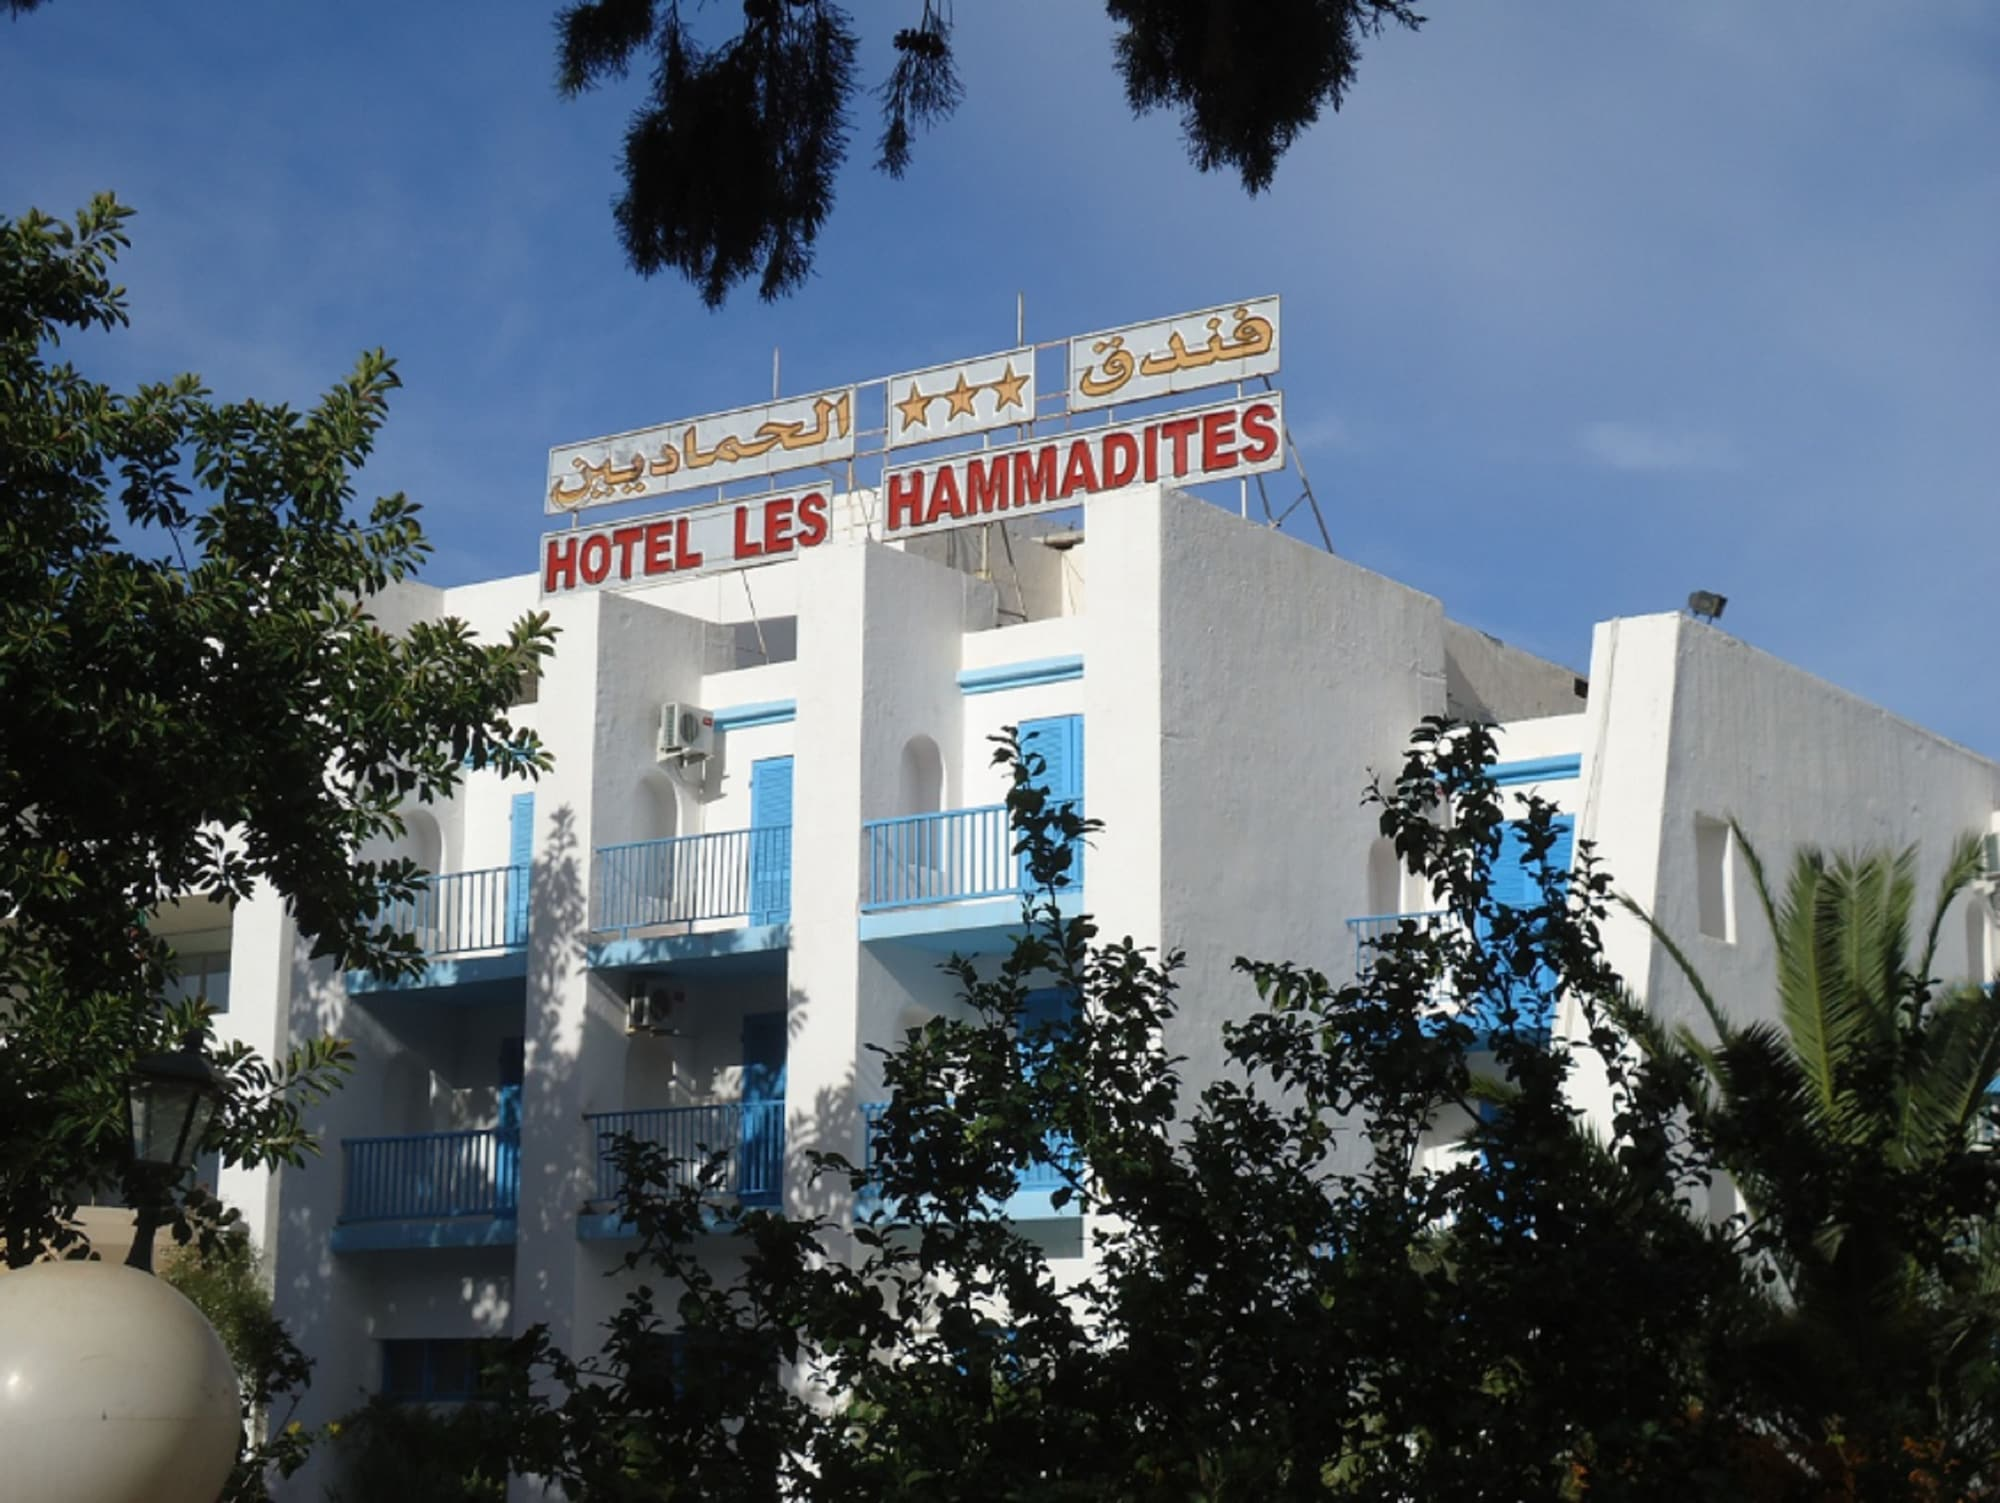 Les Hammadites, Tichy